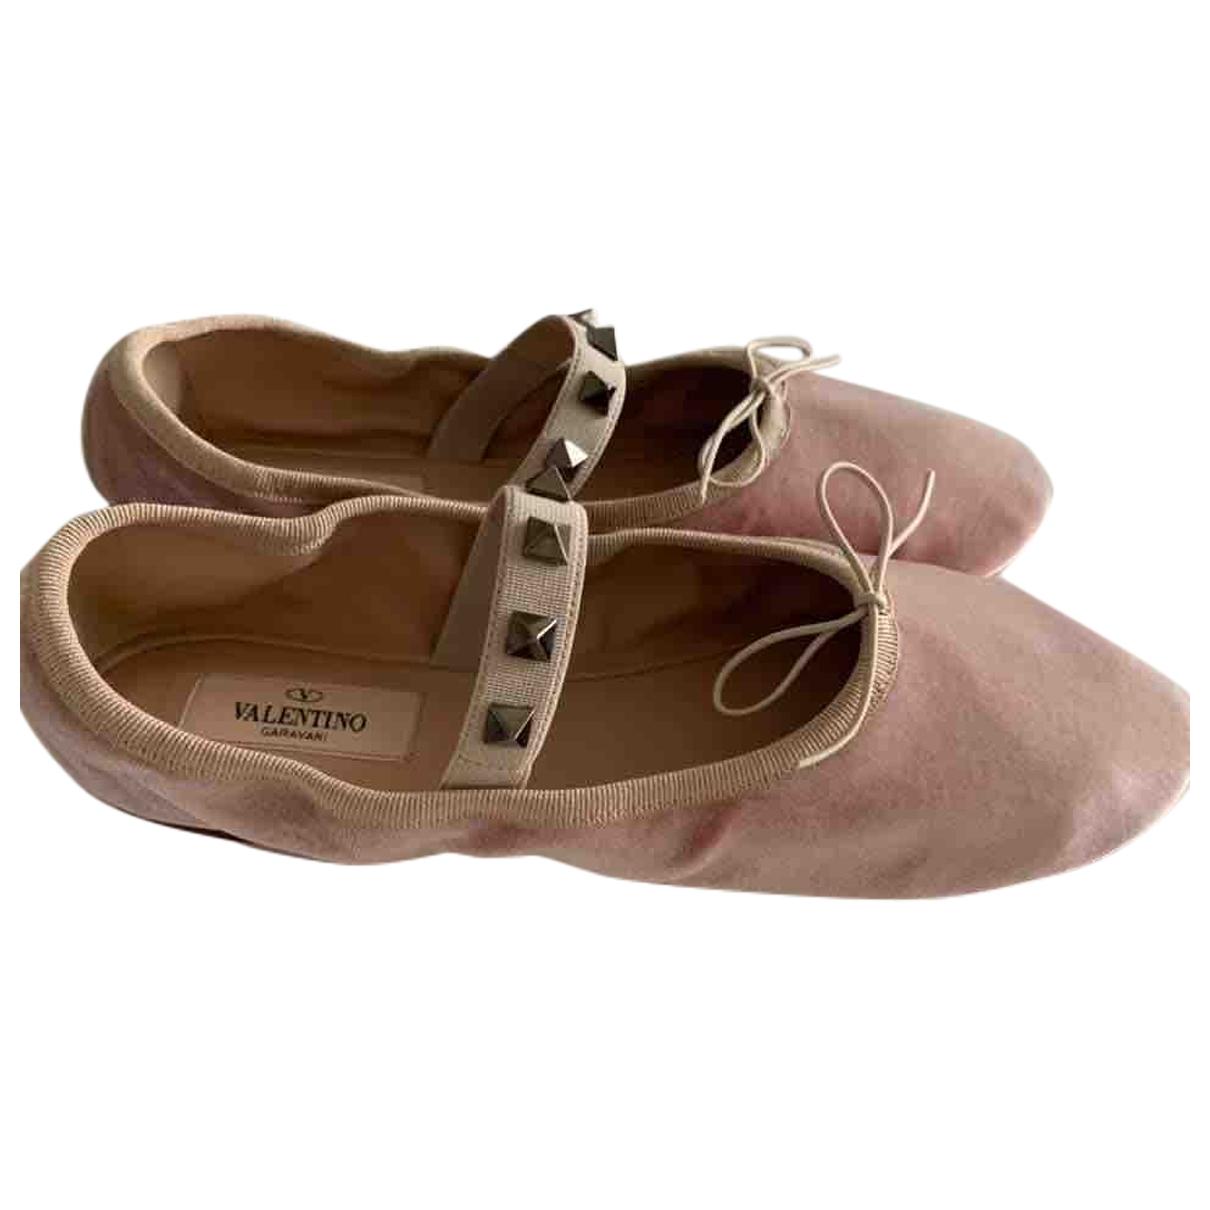 Valentino Garavani Rockstud Pink Velvet Ballet flats for Women 38 EU